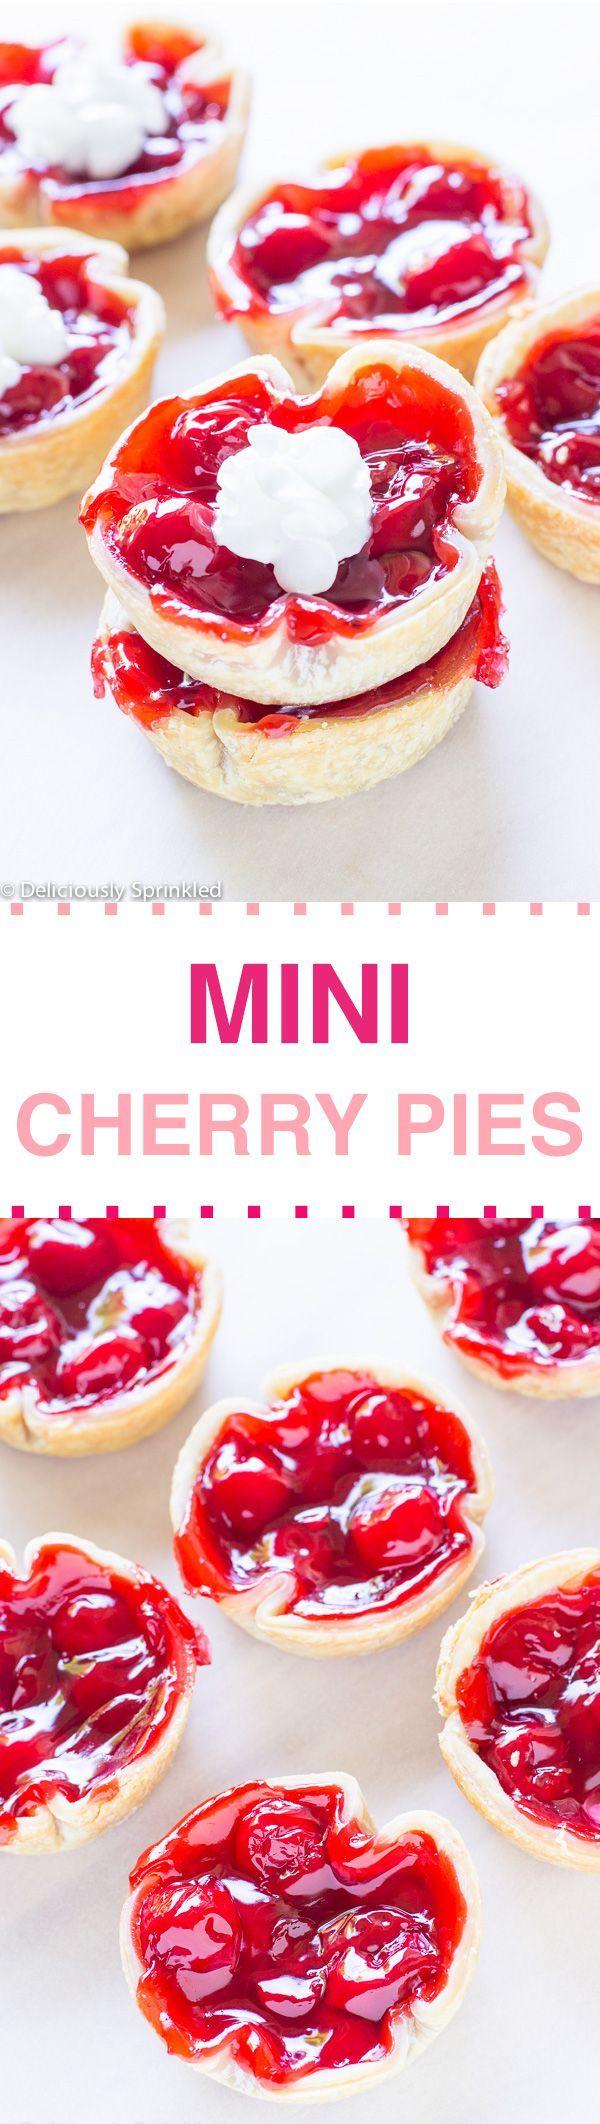 about Mini Cherry Pies on Pinterest | Cherry pie cupcakes, Cherry ...